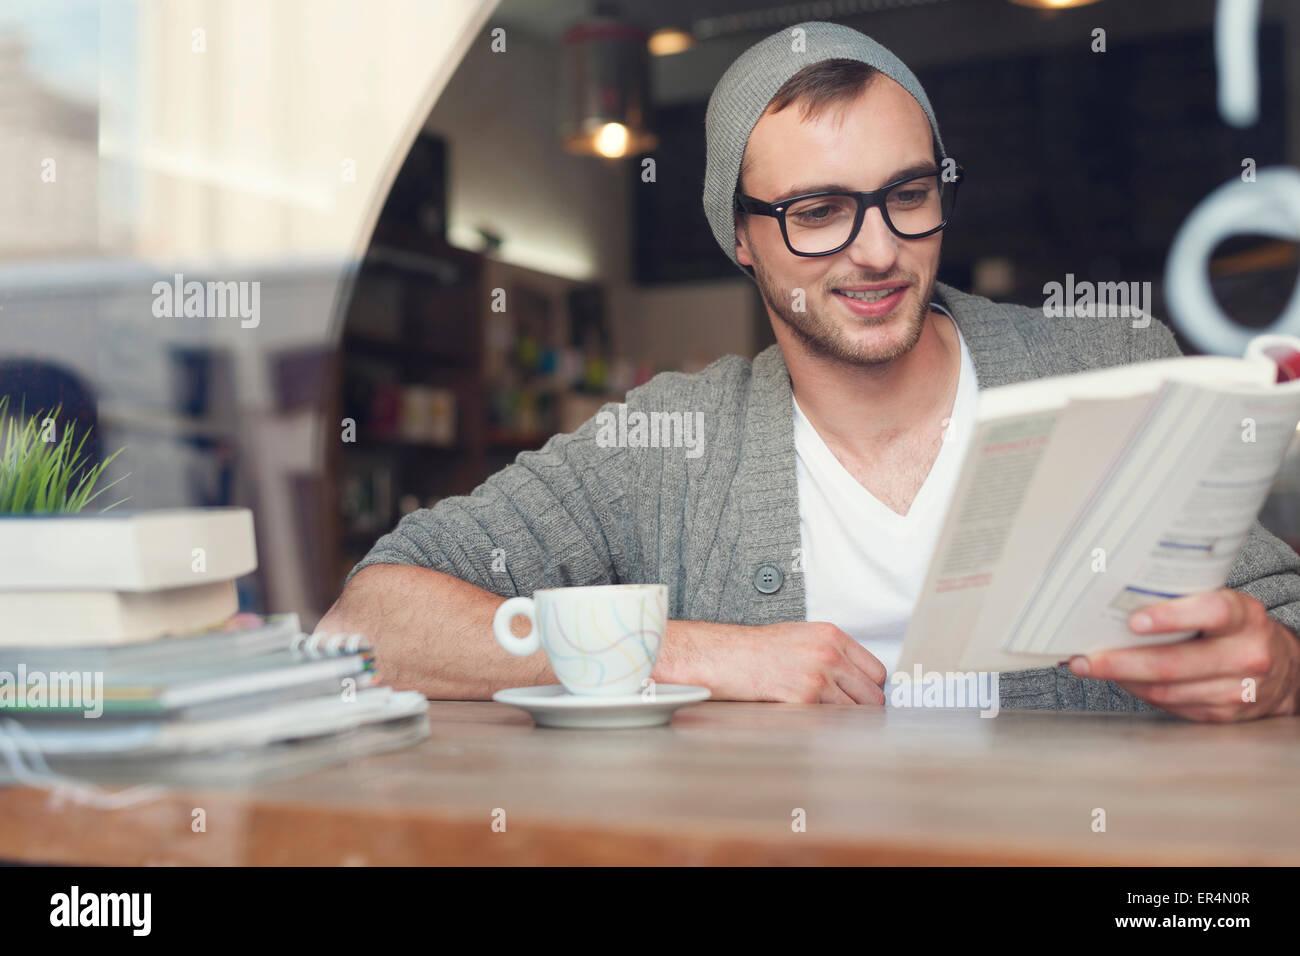 Sonriendo hipster hombre libro de lectura en el café. Cracovia, Polonia Imagen De Stock